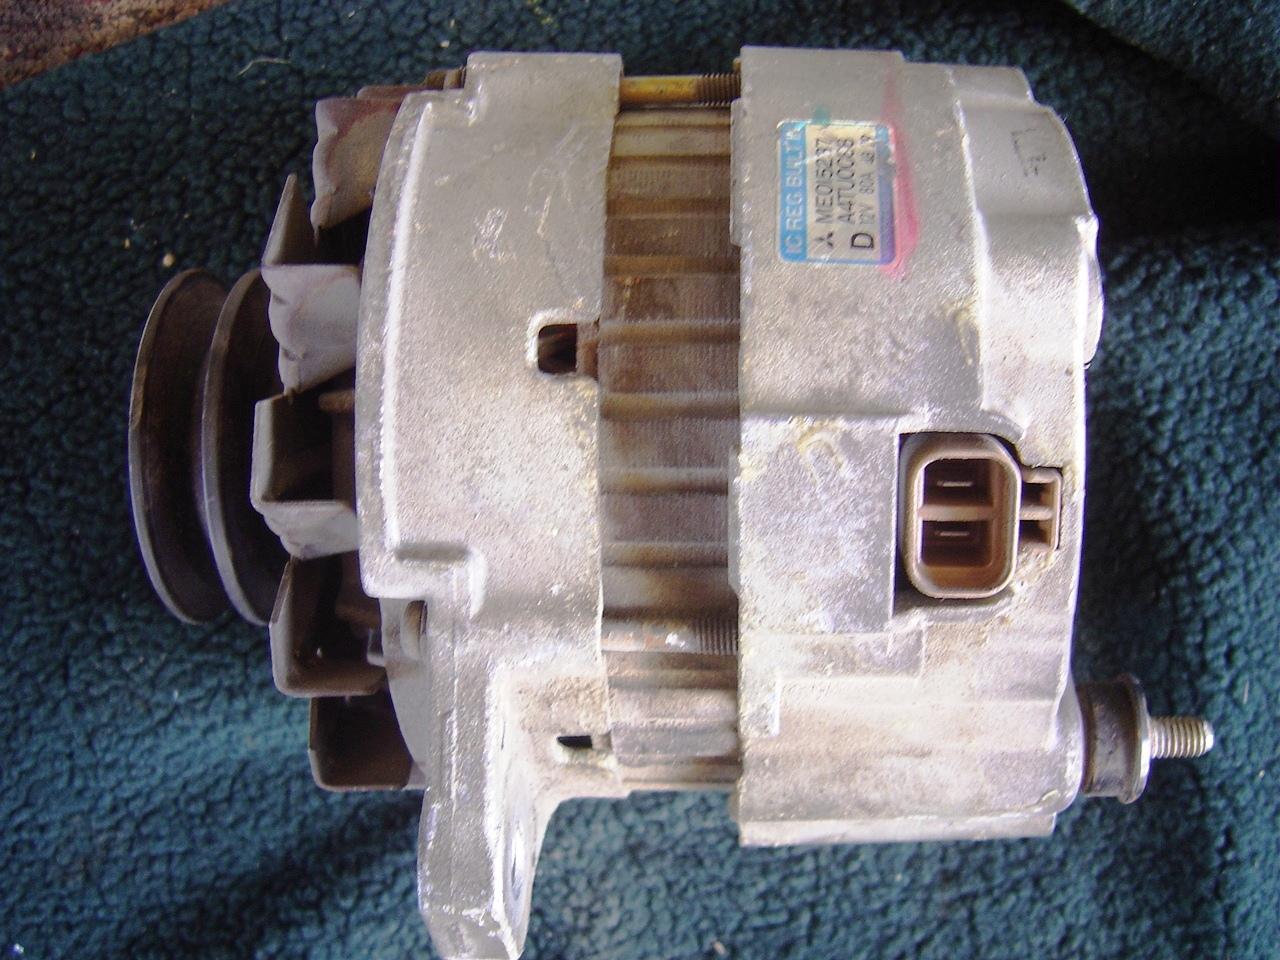 Wiring Diagram Additionally 2002 Ford Explorer Rear Wiper Motor Wiring